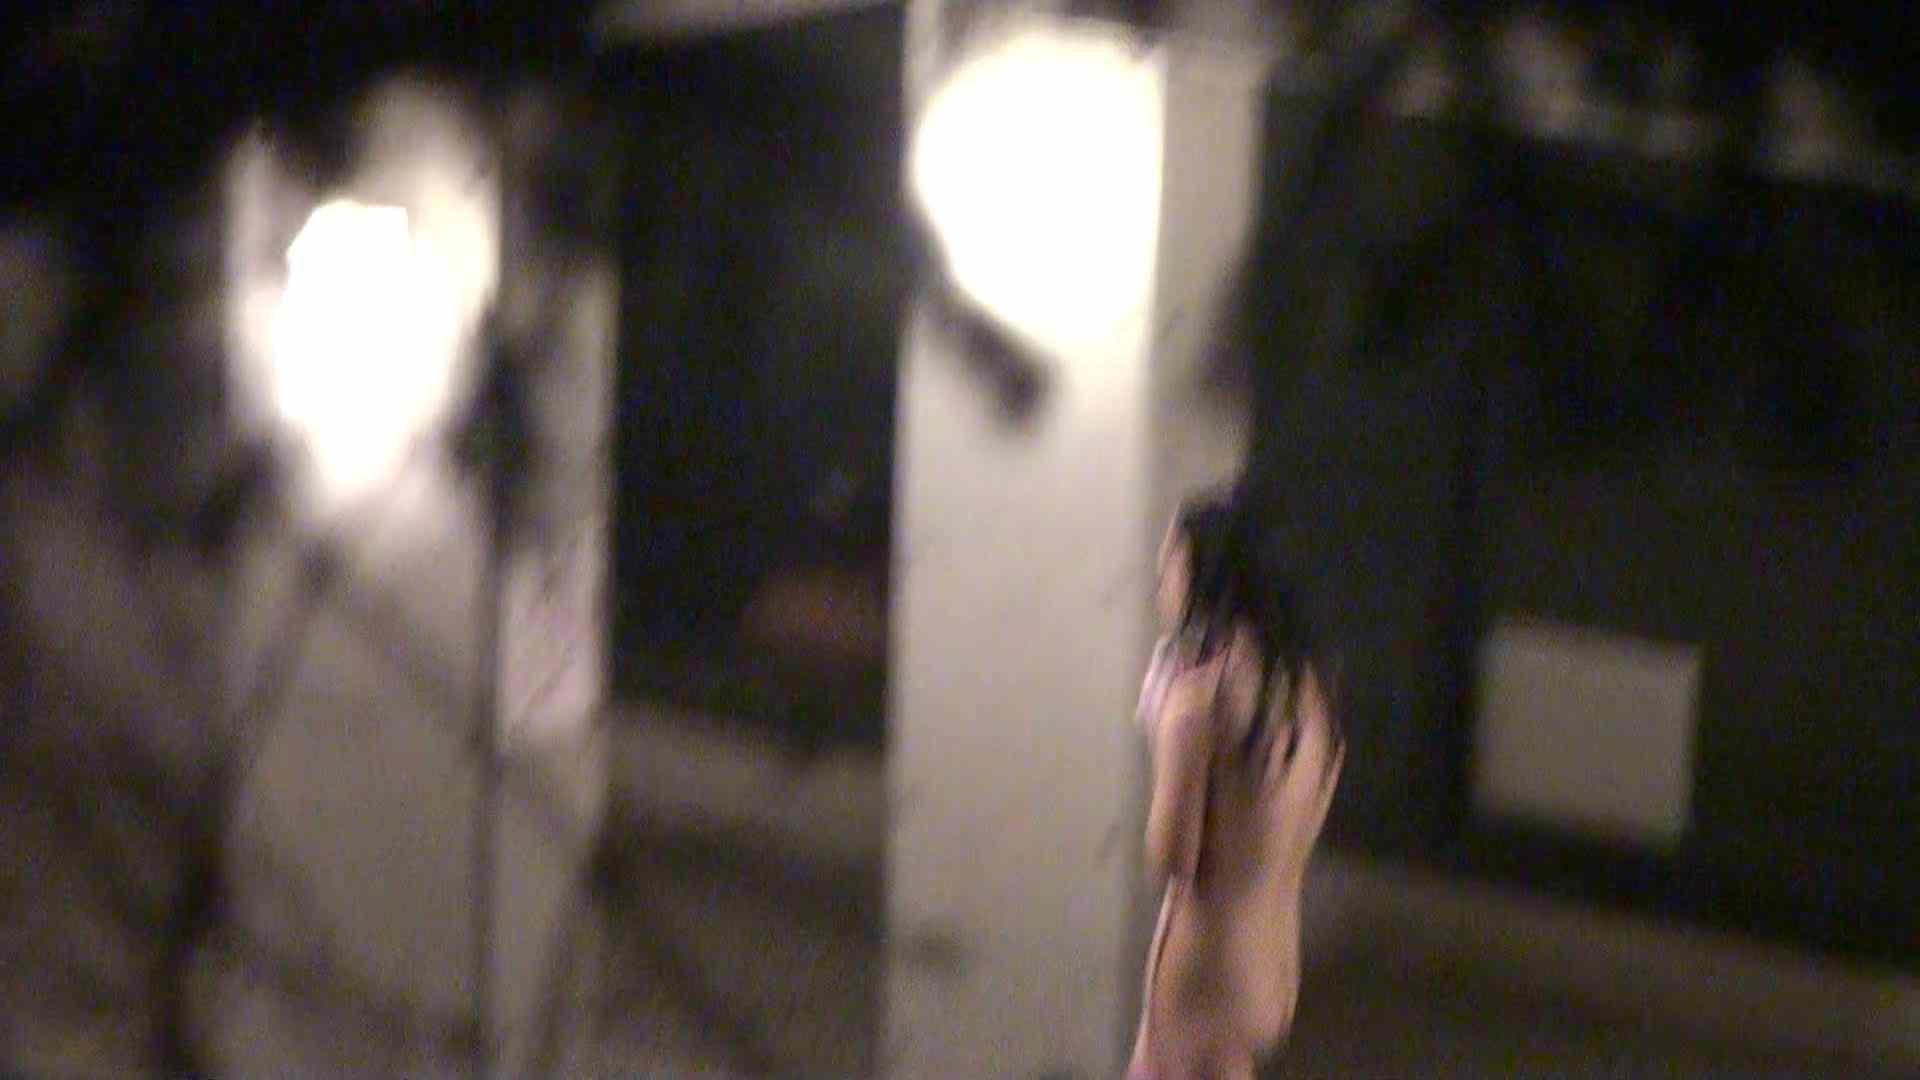 Aquaな露天風呂Vol.381 露天風呂突入 戯れ無修正画像 97pic 5